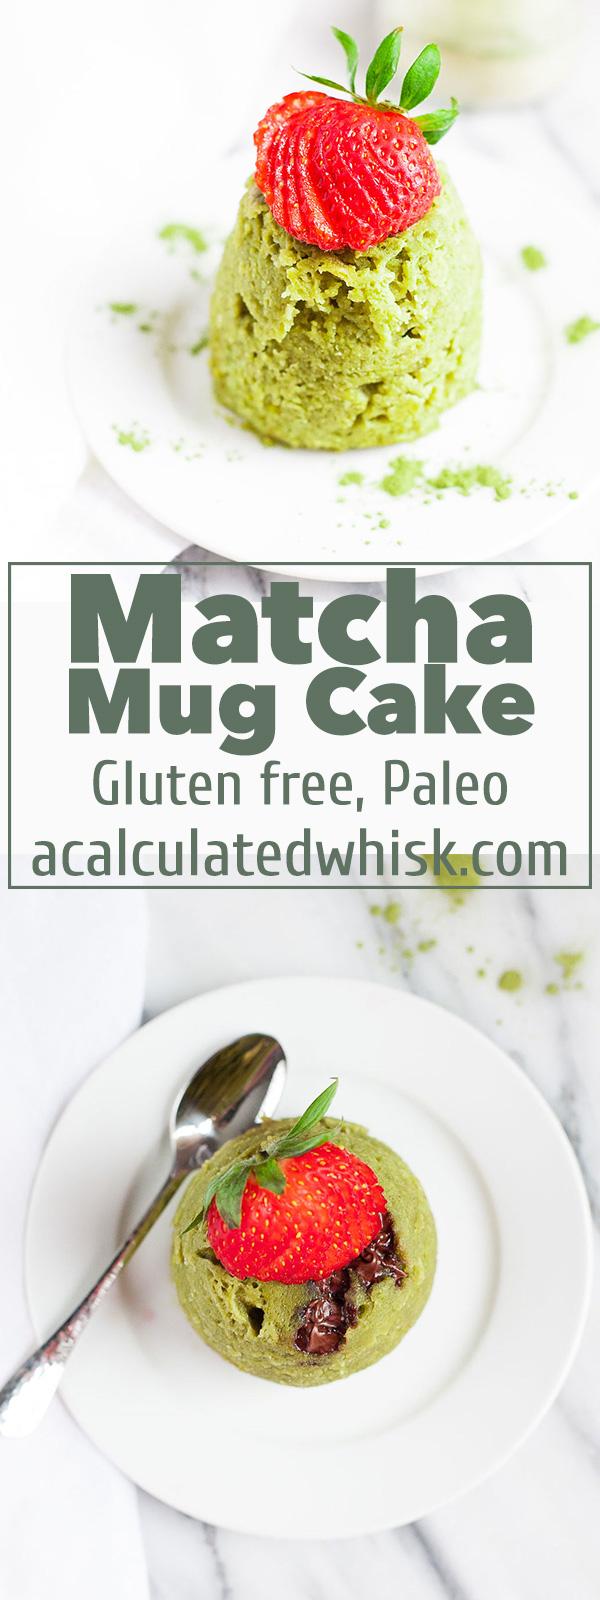 Pastel de Matcha Mug (Paleo, sin gluten) | acalculatedwhisk.com